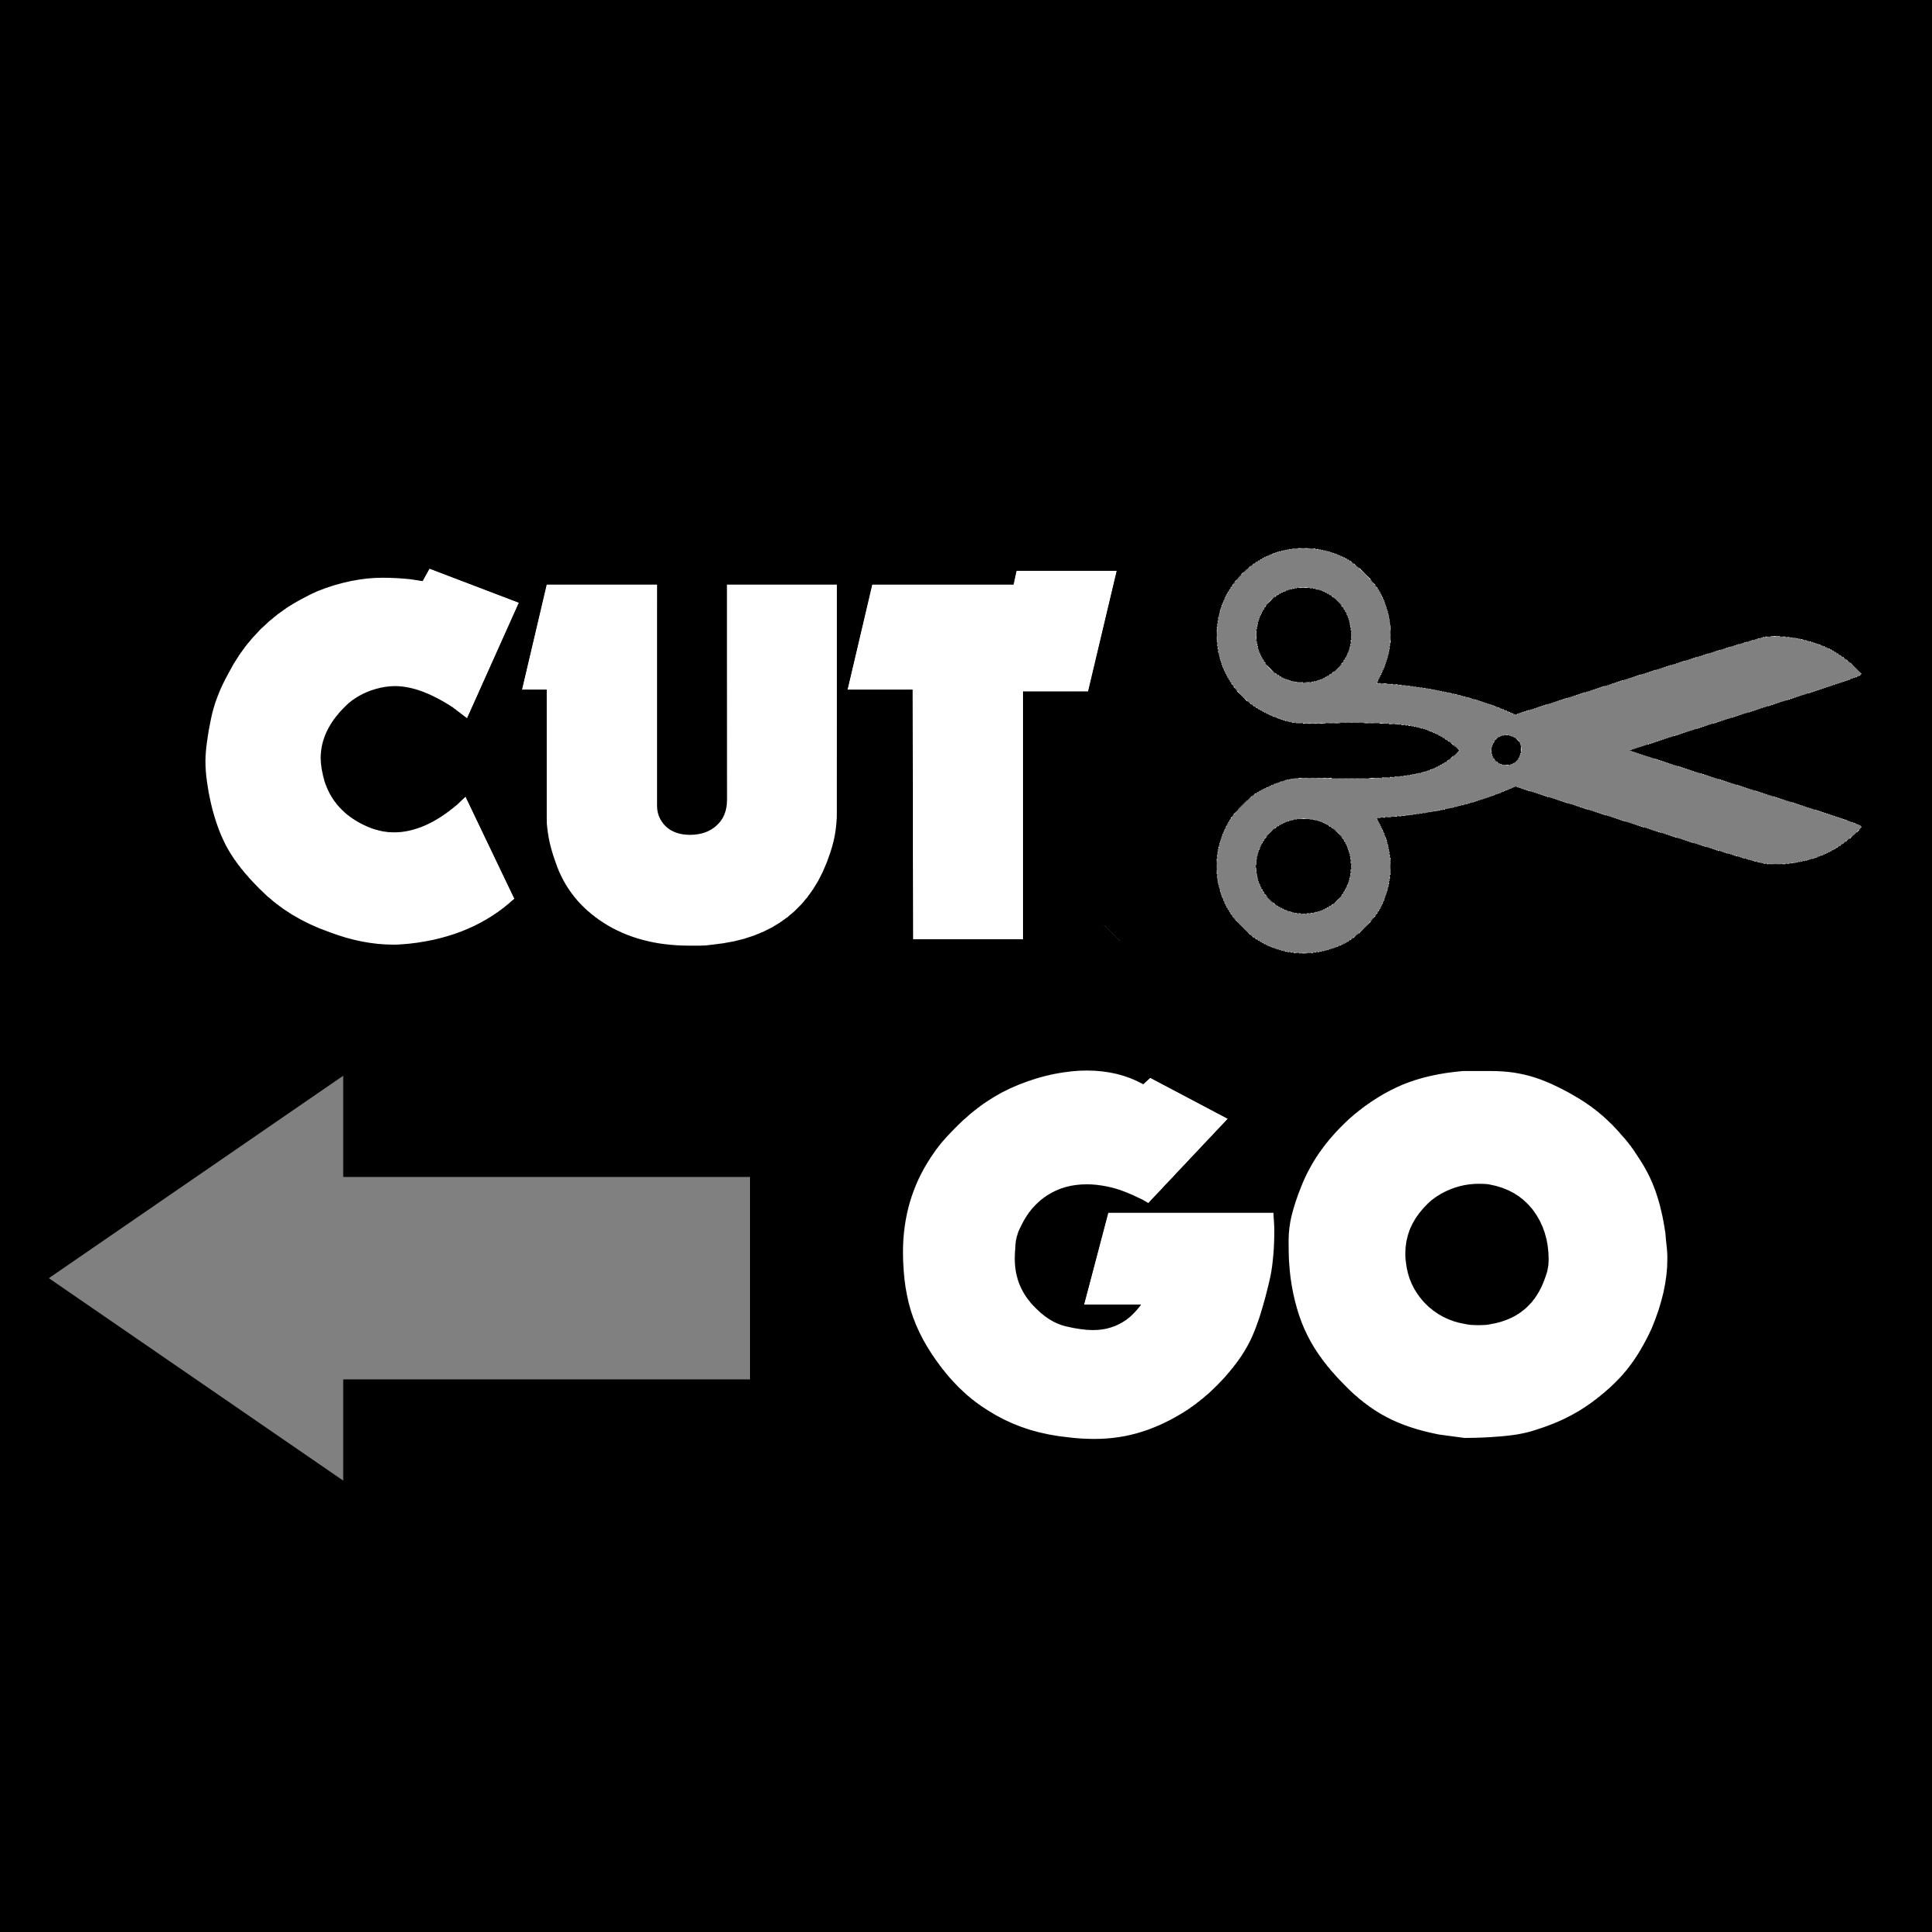 Cut & Go